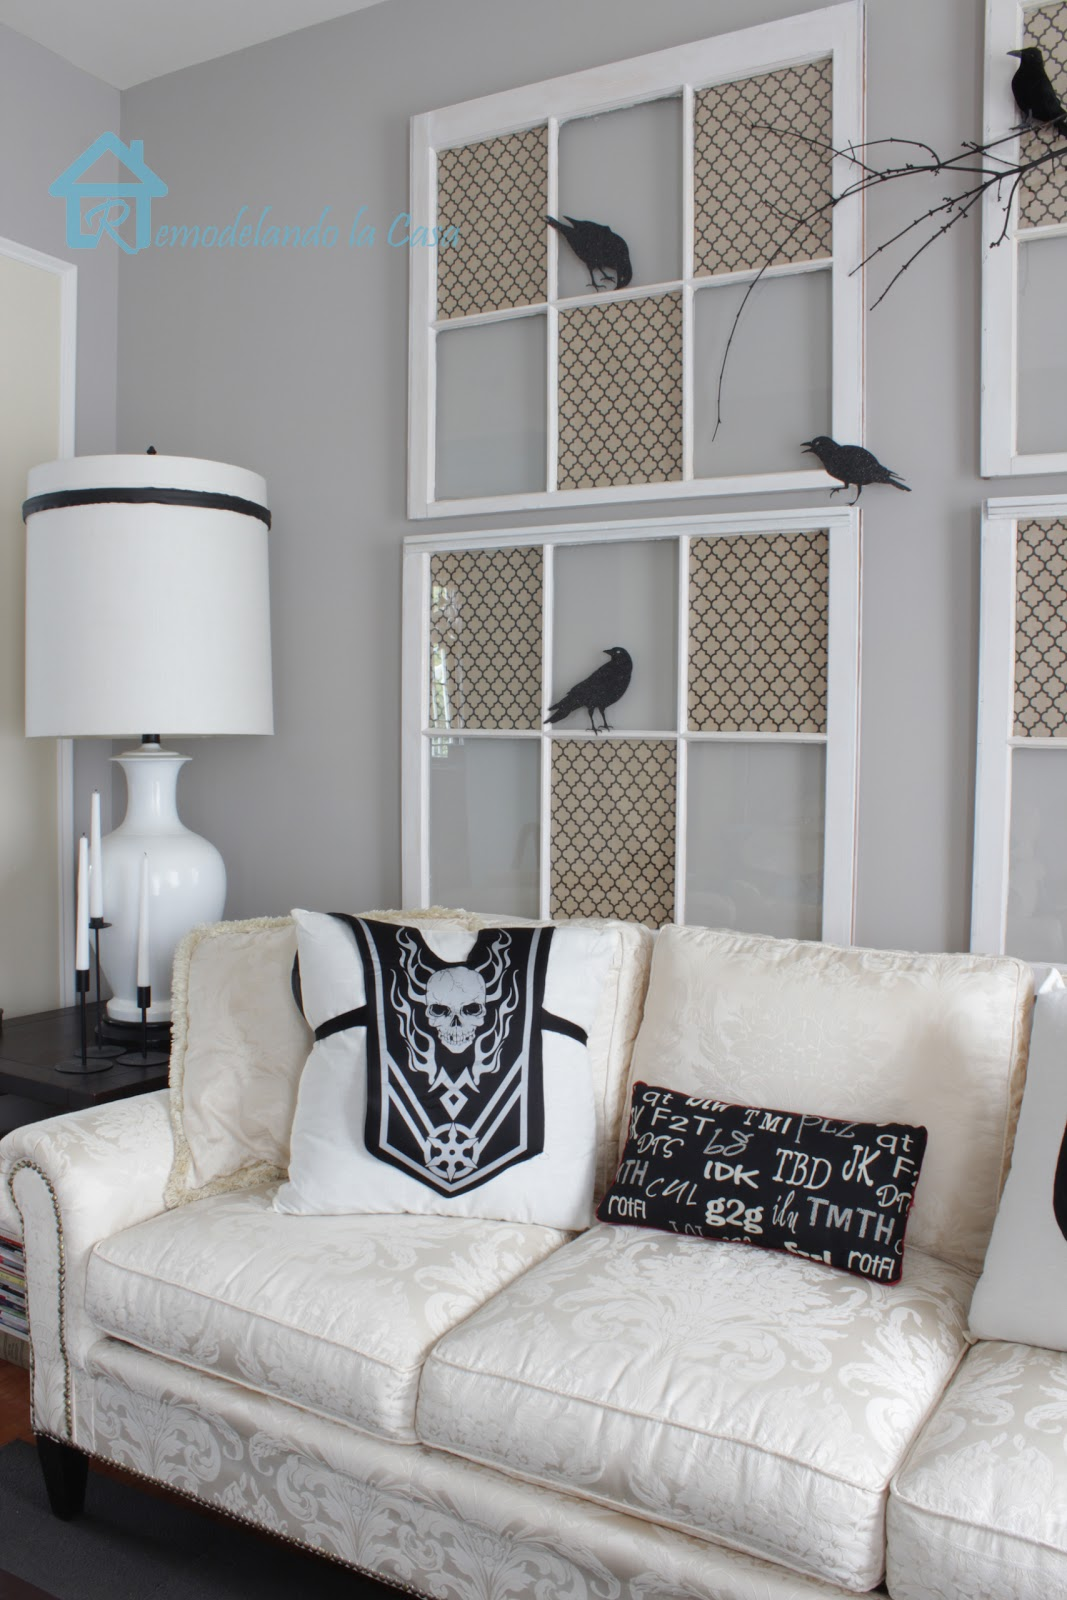 21 Stylish Living Room Halloween Decorations Ideas on Decor For Room  id=57518